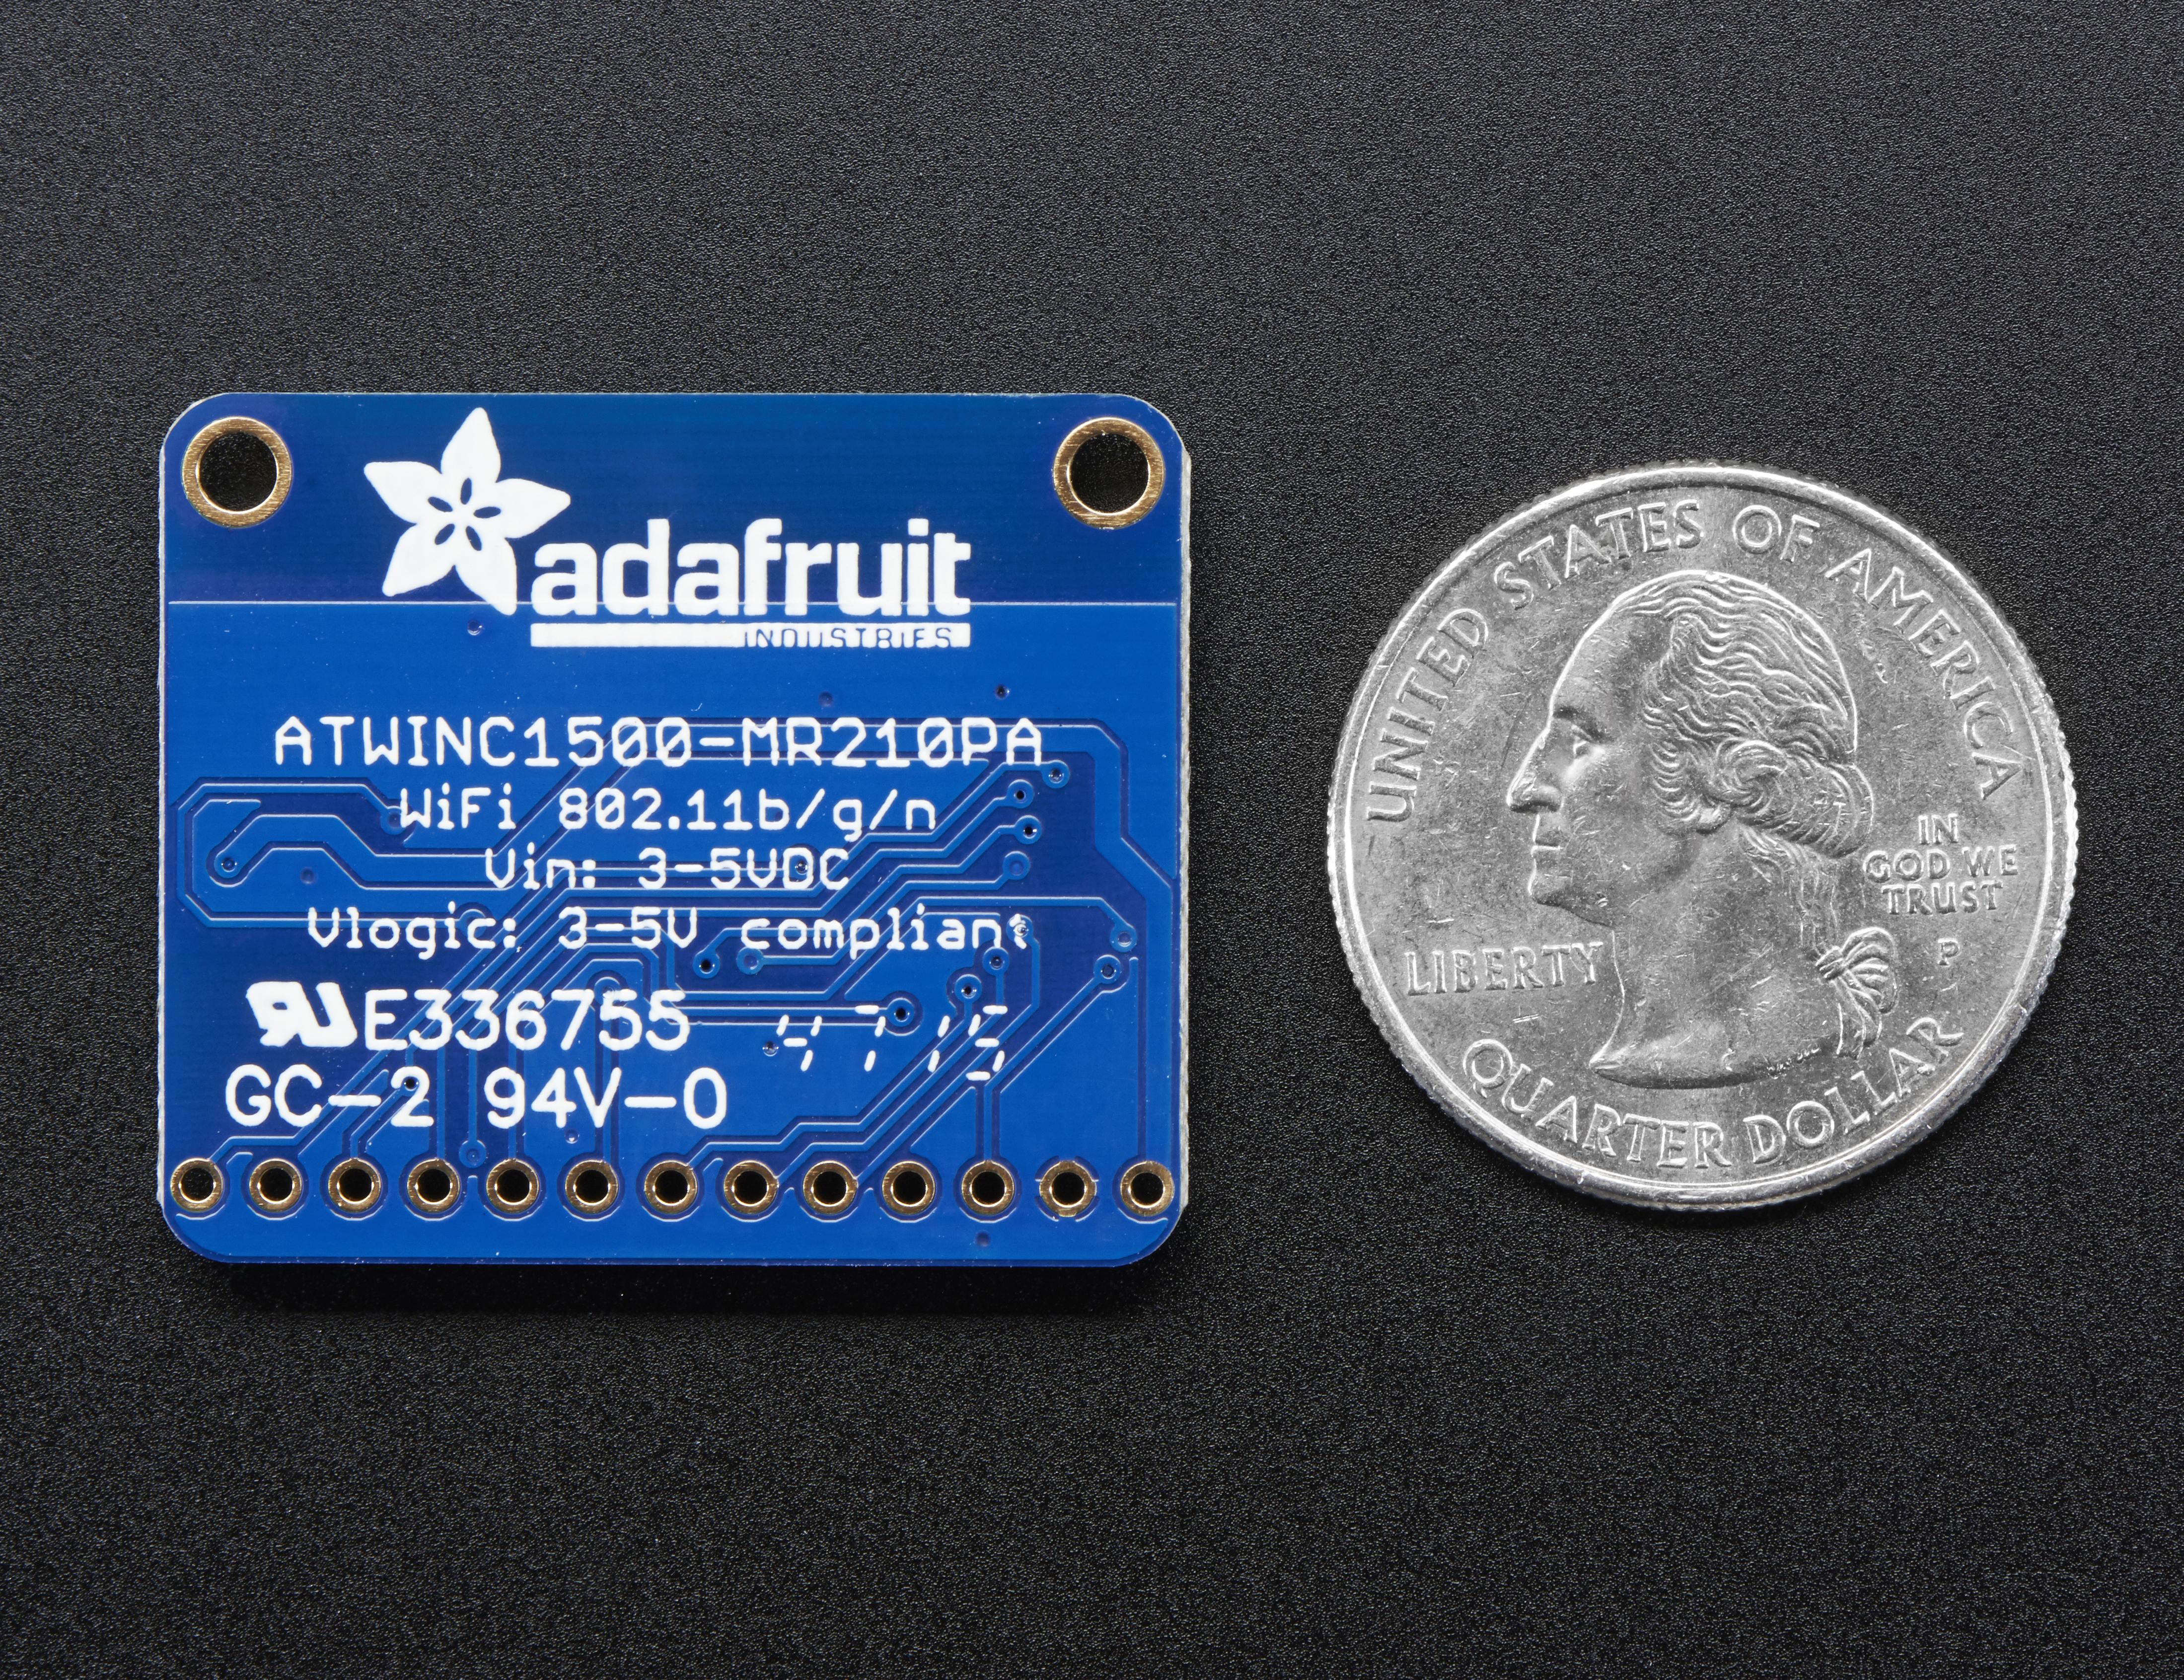 adafruit_products_2999_quarter_ORIG.jpg